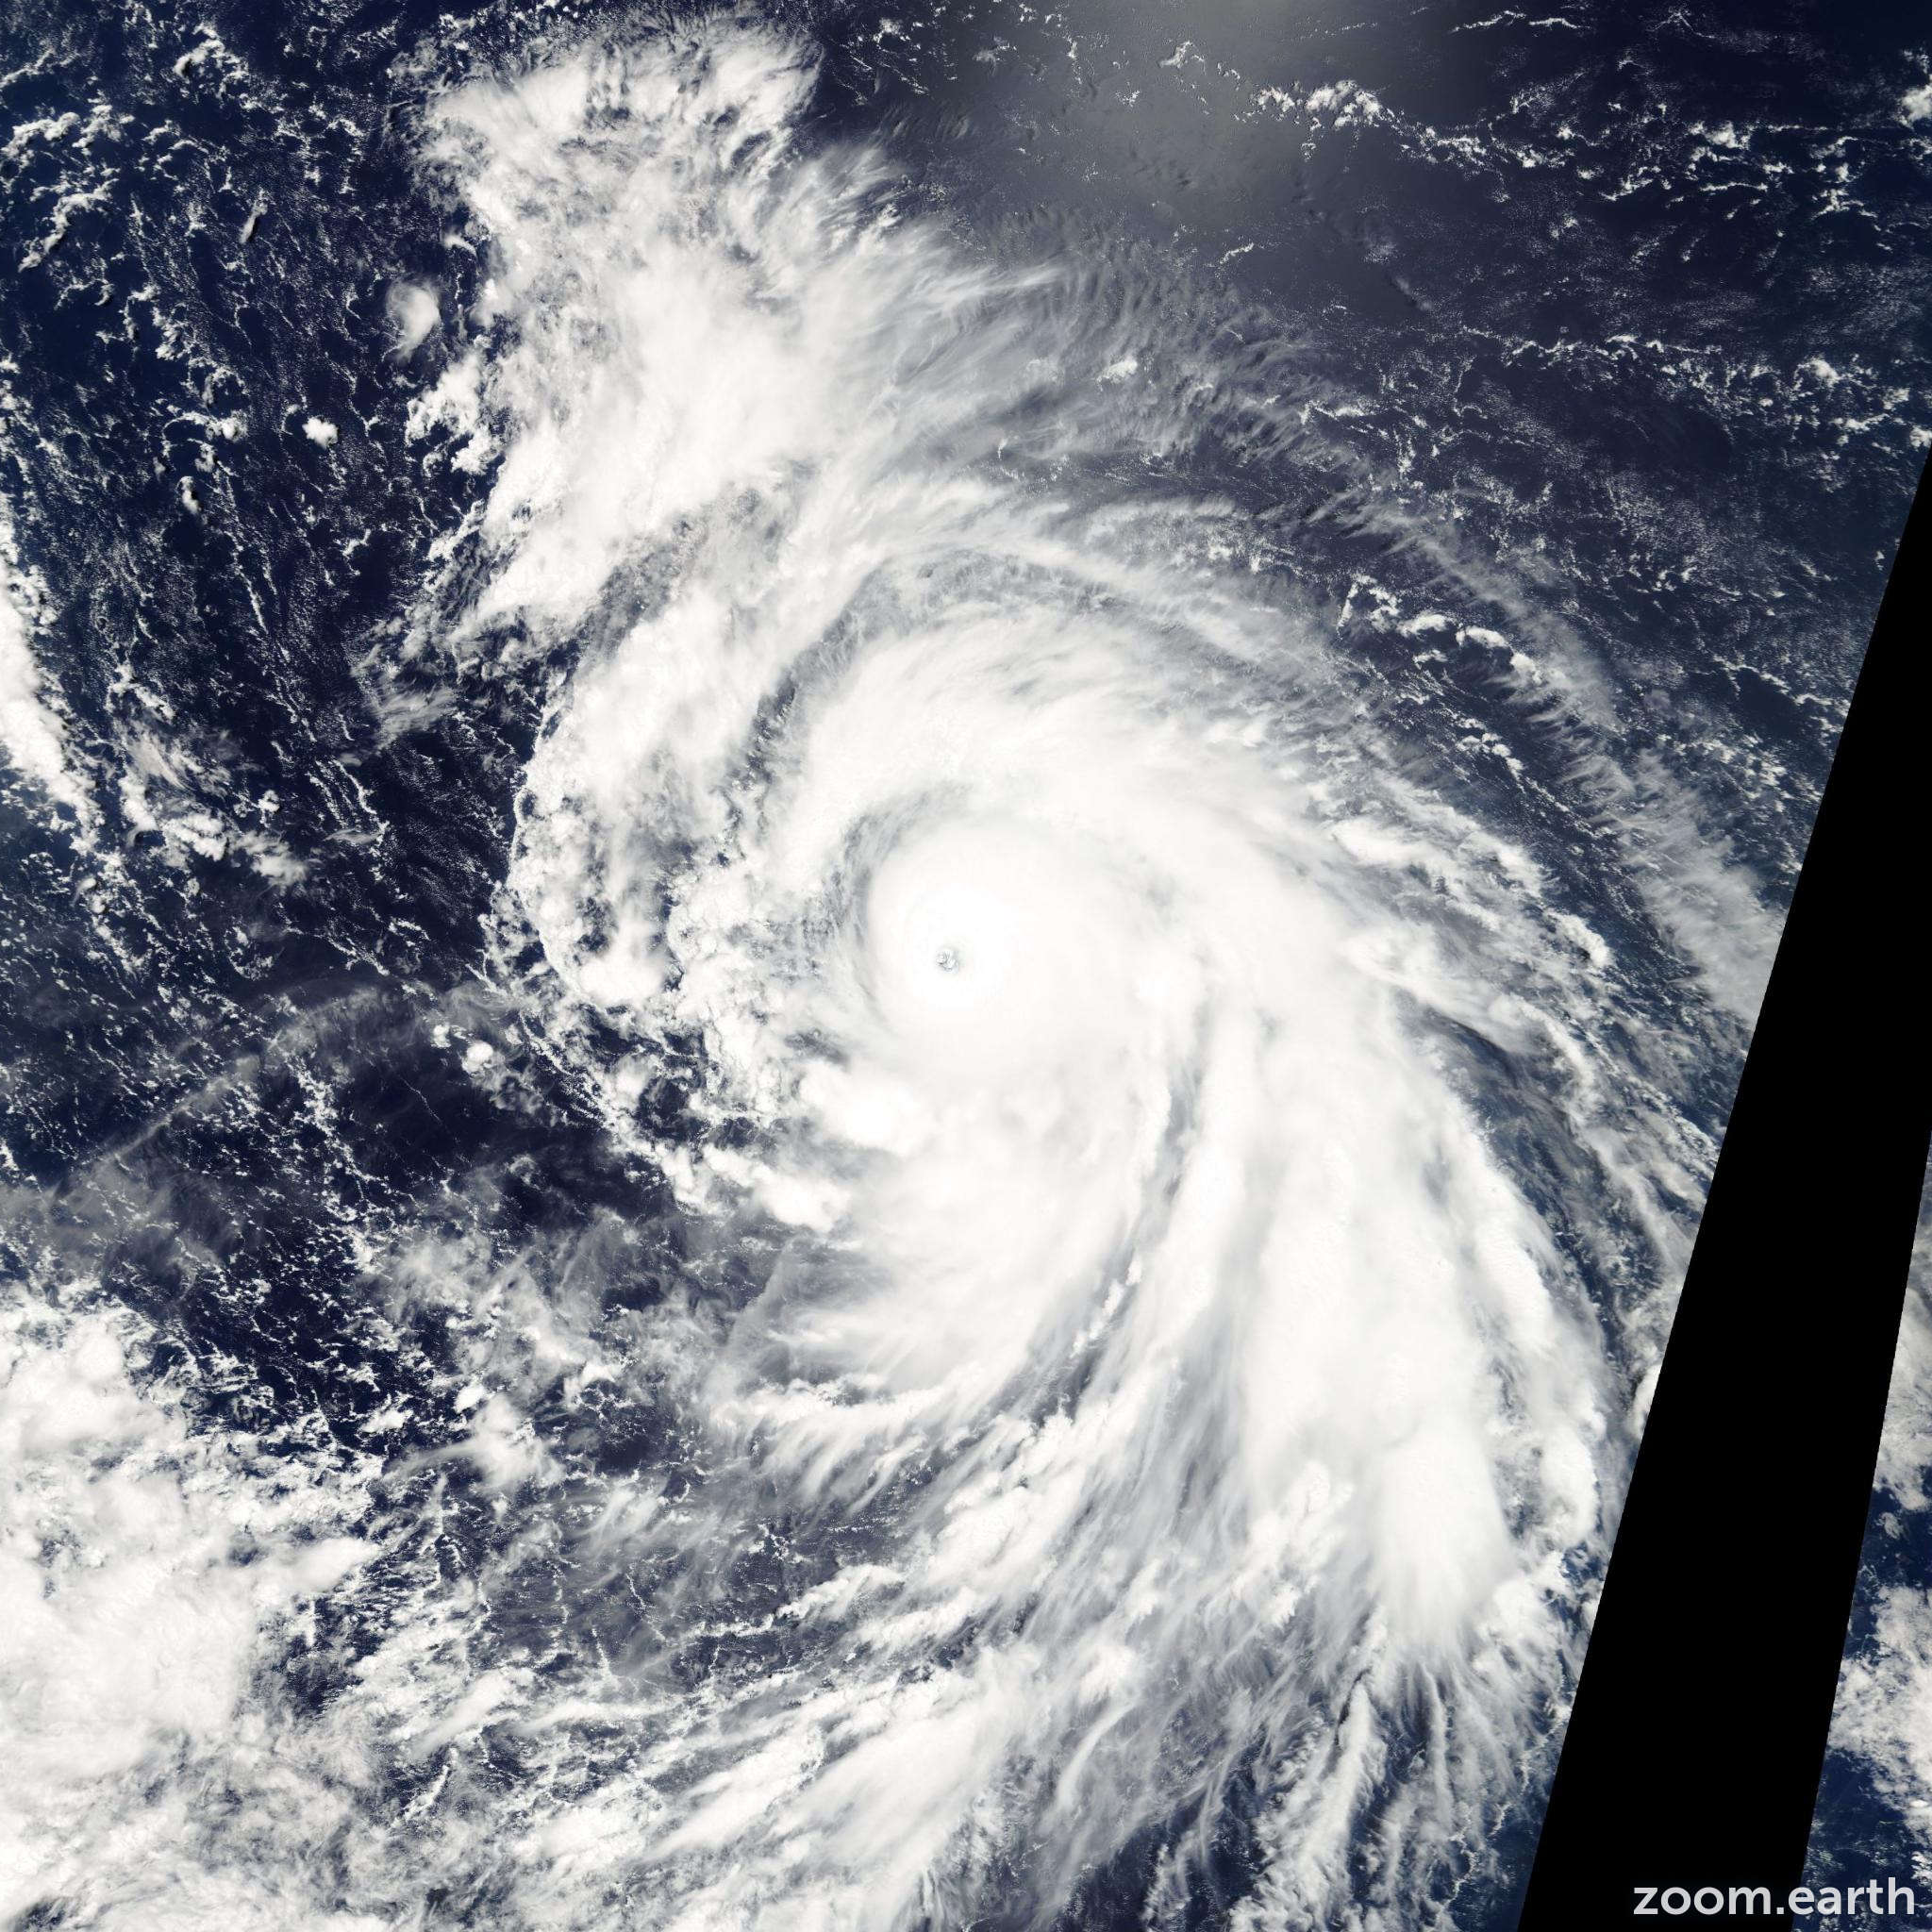 Satellite image of Typhoon Fengshen 2002